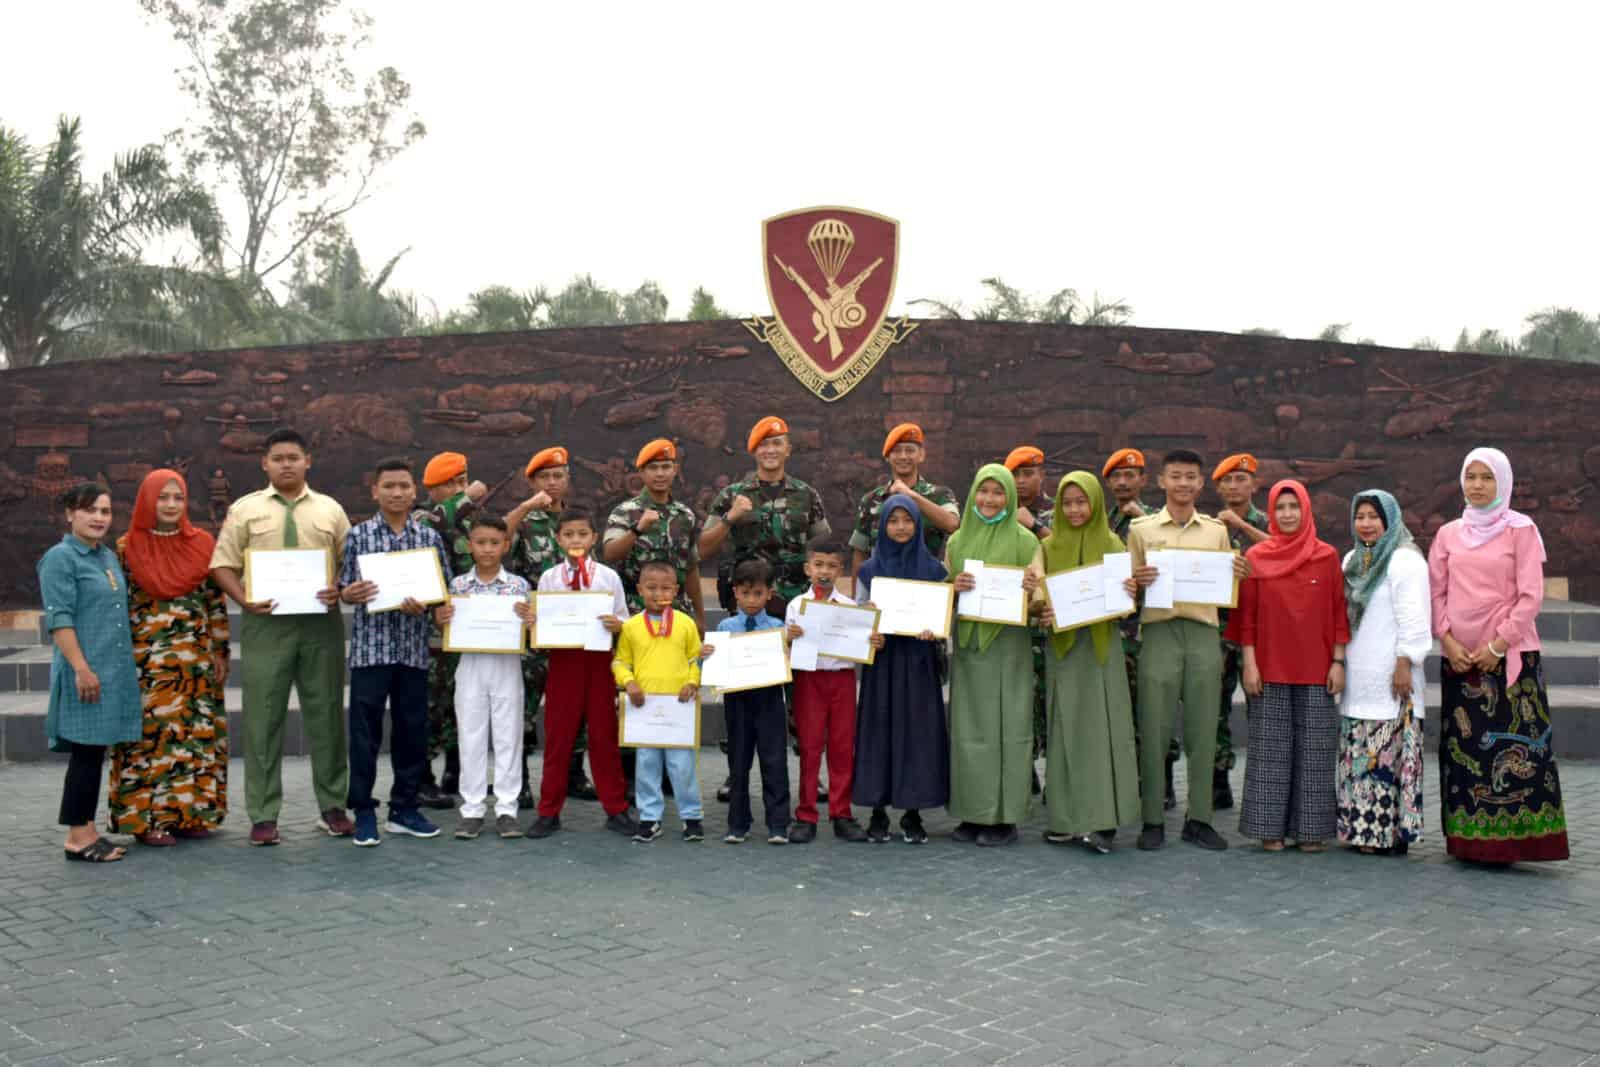 Danyonko 462 Paskhas Berikan Penghargaan Kepada Anak Prajurit Yang Berprestasi